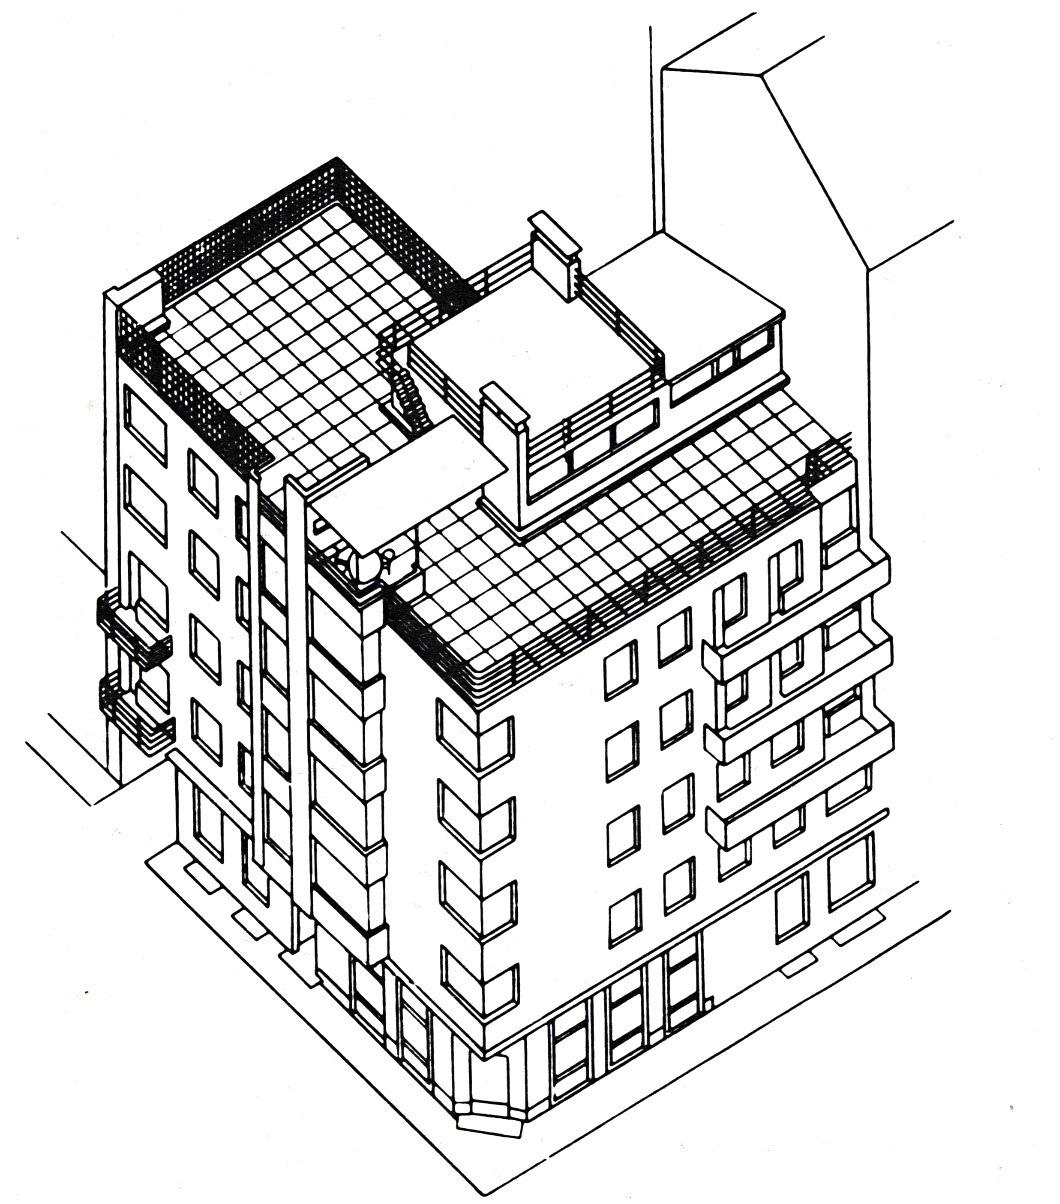 Moisei Ginzburg, Gosstrakh building in Moscow (1926-1927), axonometric view1